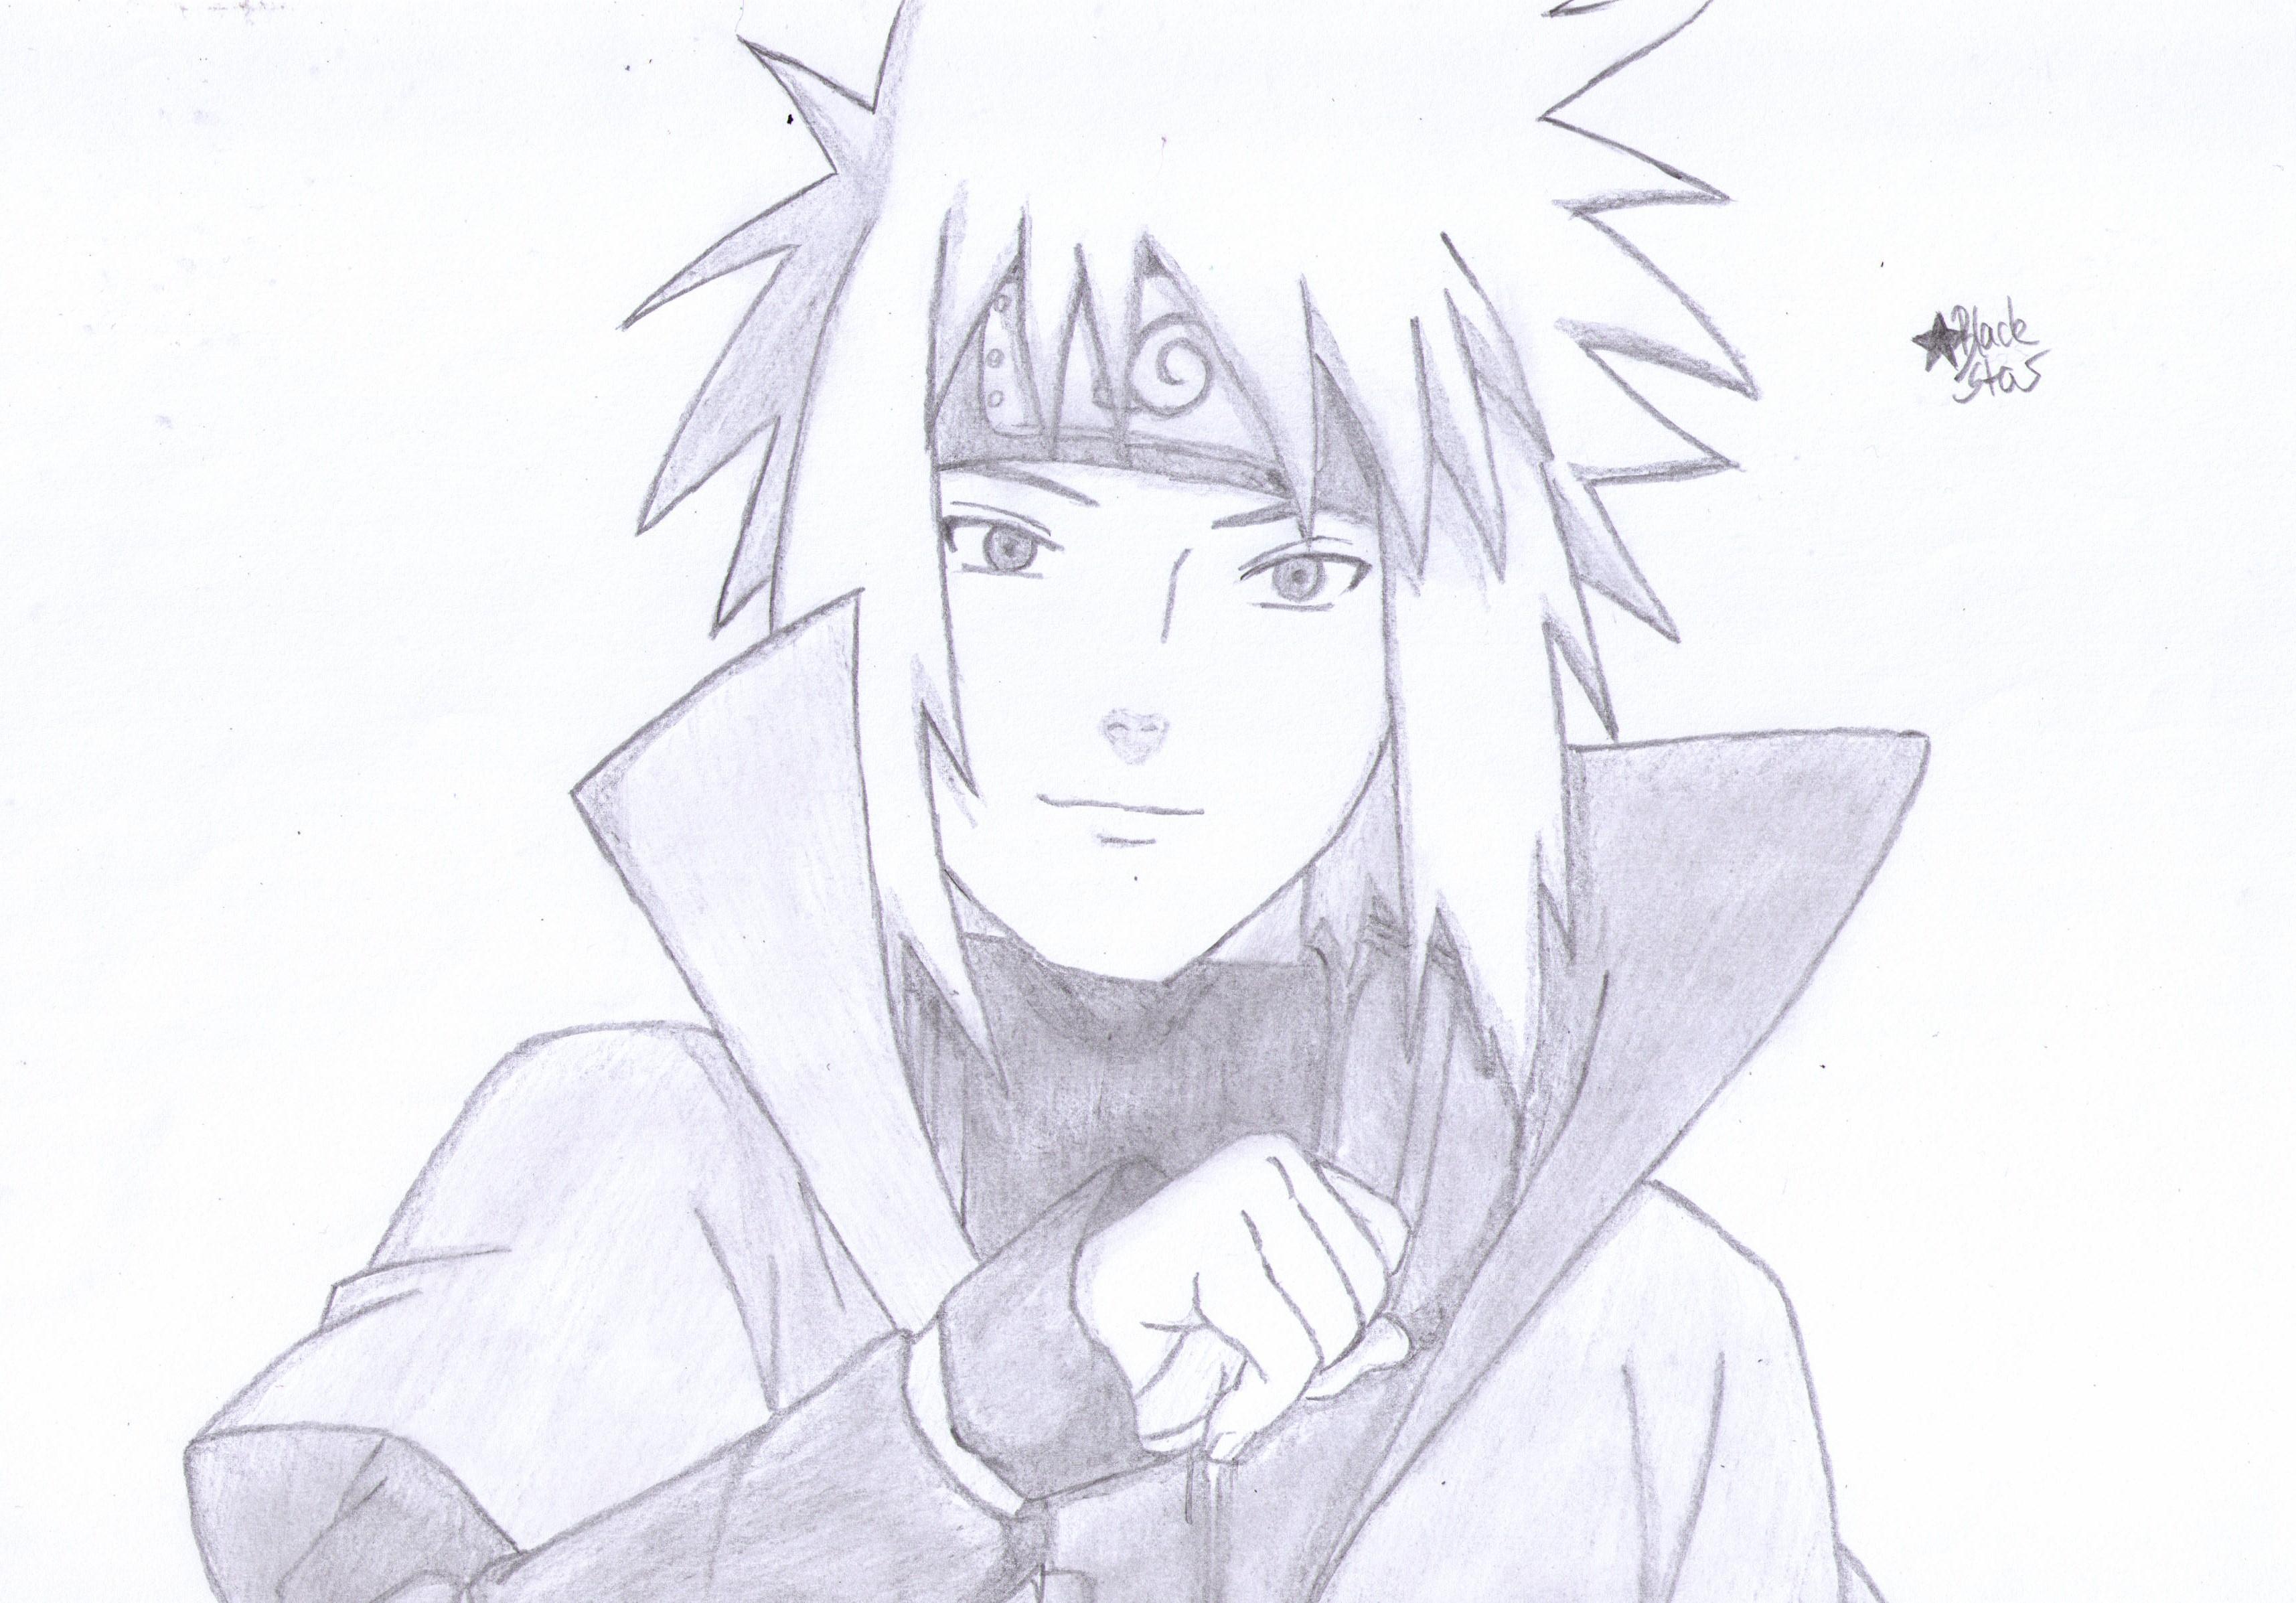 Minato Namikaze (Naruto) by BlackStarLGArt on DeviantArt